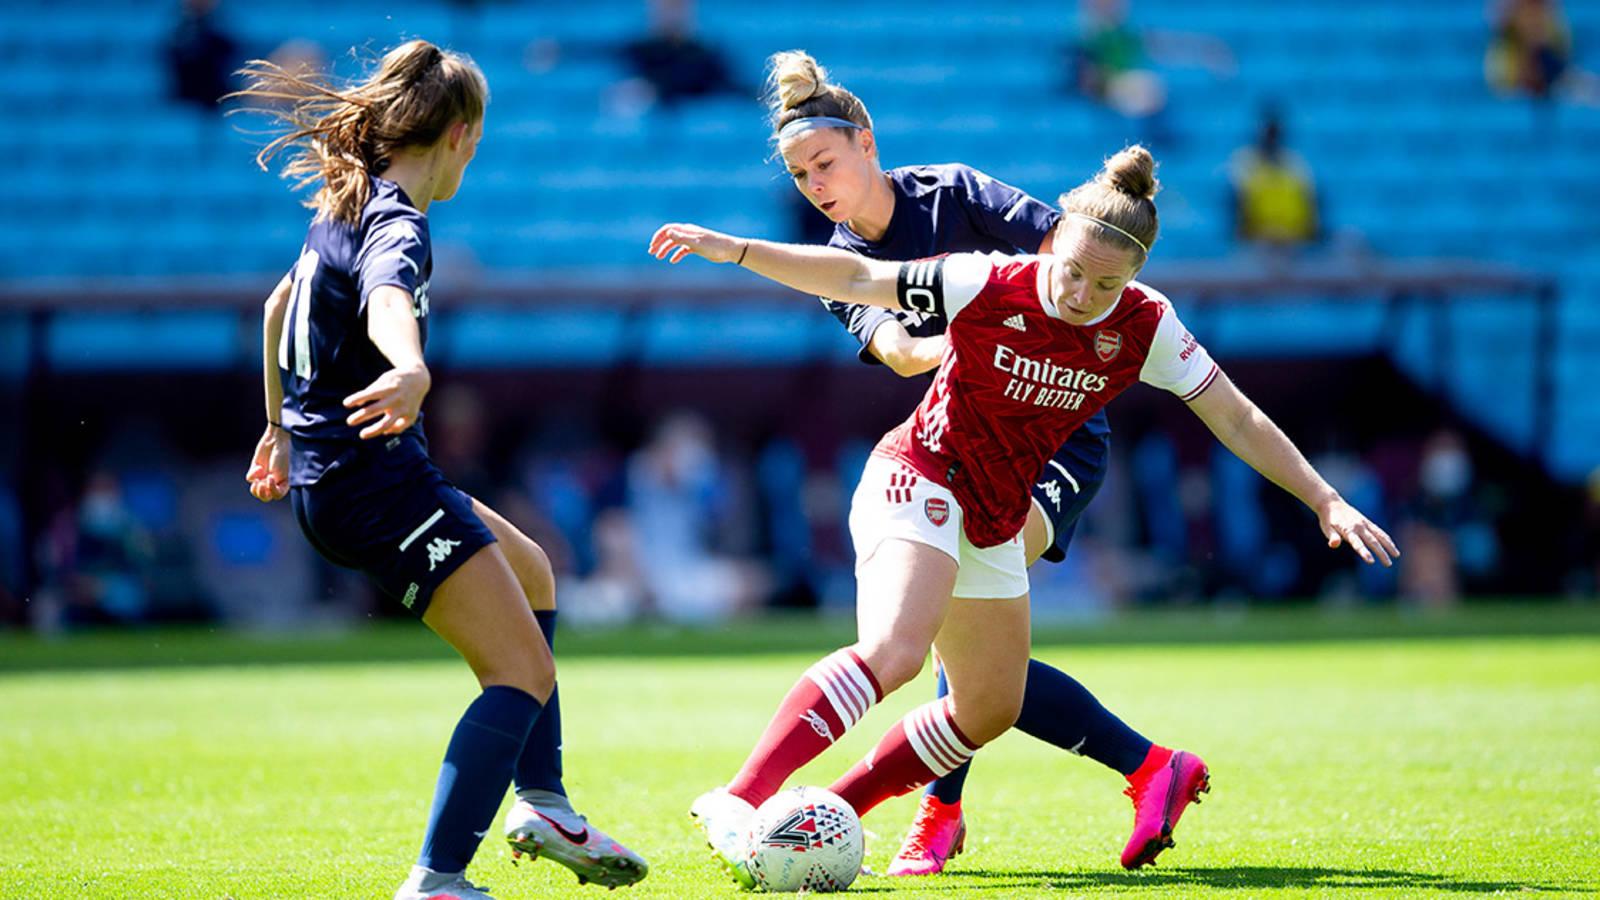 Friendly: Arsenal v Aston Villa Women - Gallery | News | Arsenal.com